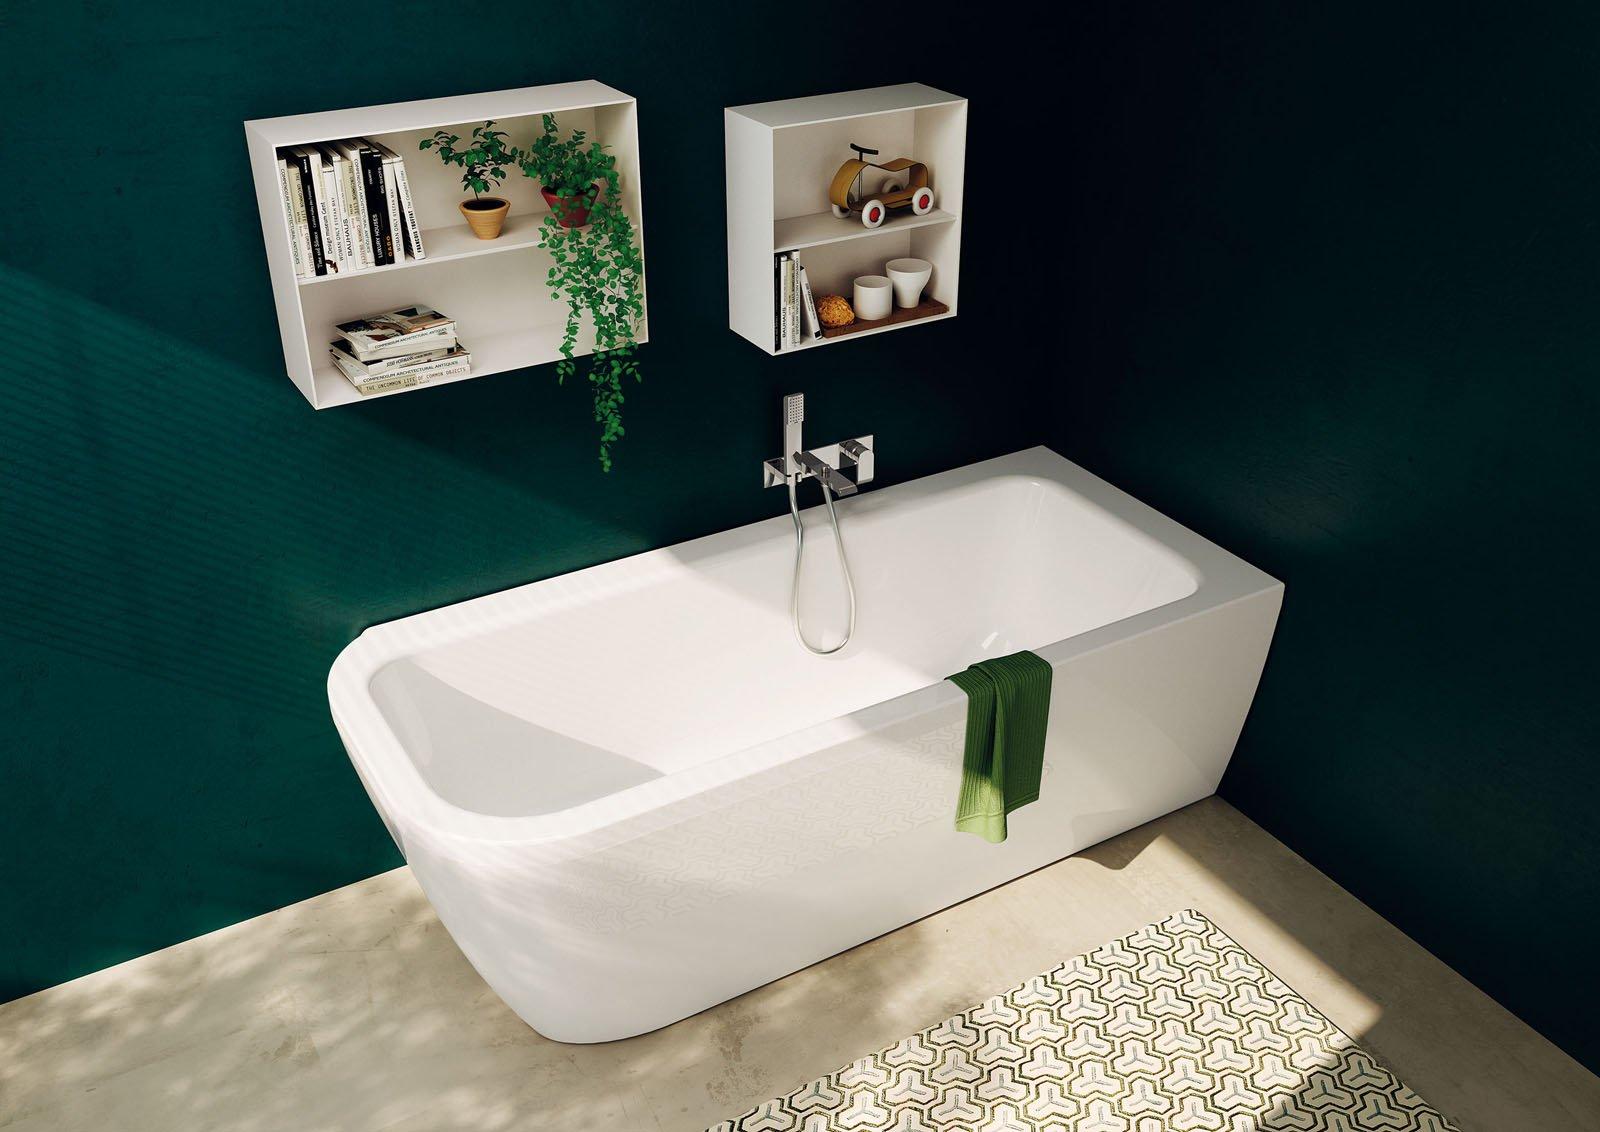 Vasca Da Bagno Incasso Ceramica : Vasche da bagno low cost. a partire da 182 euro cose di casa